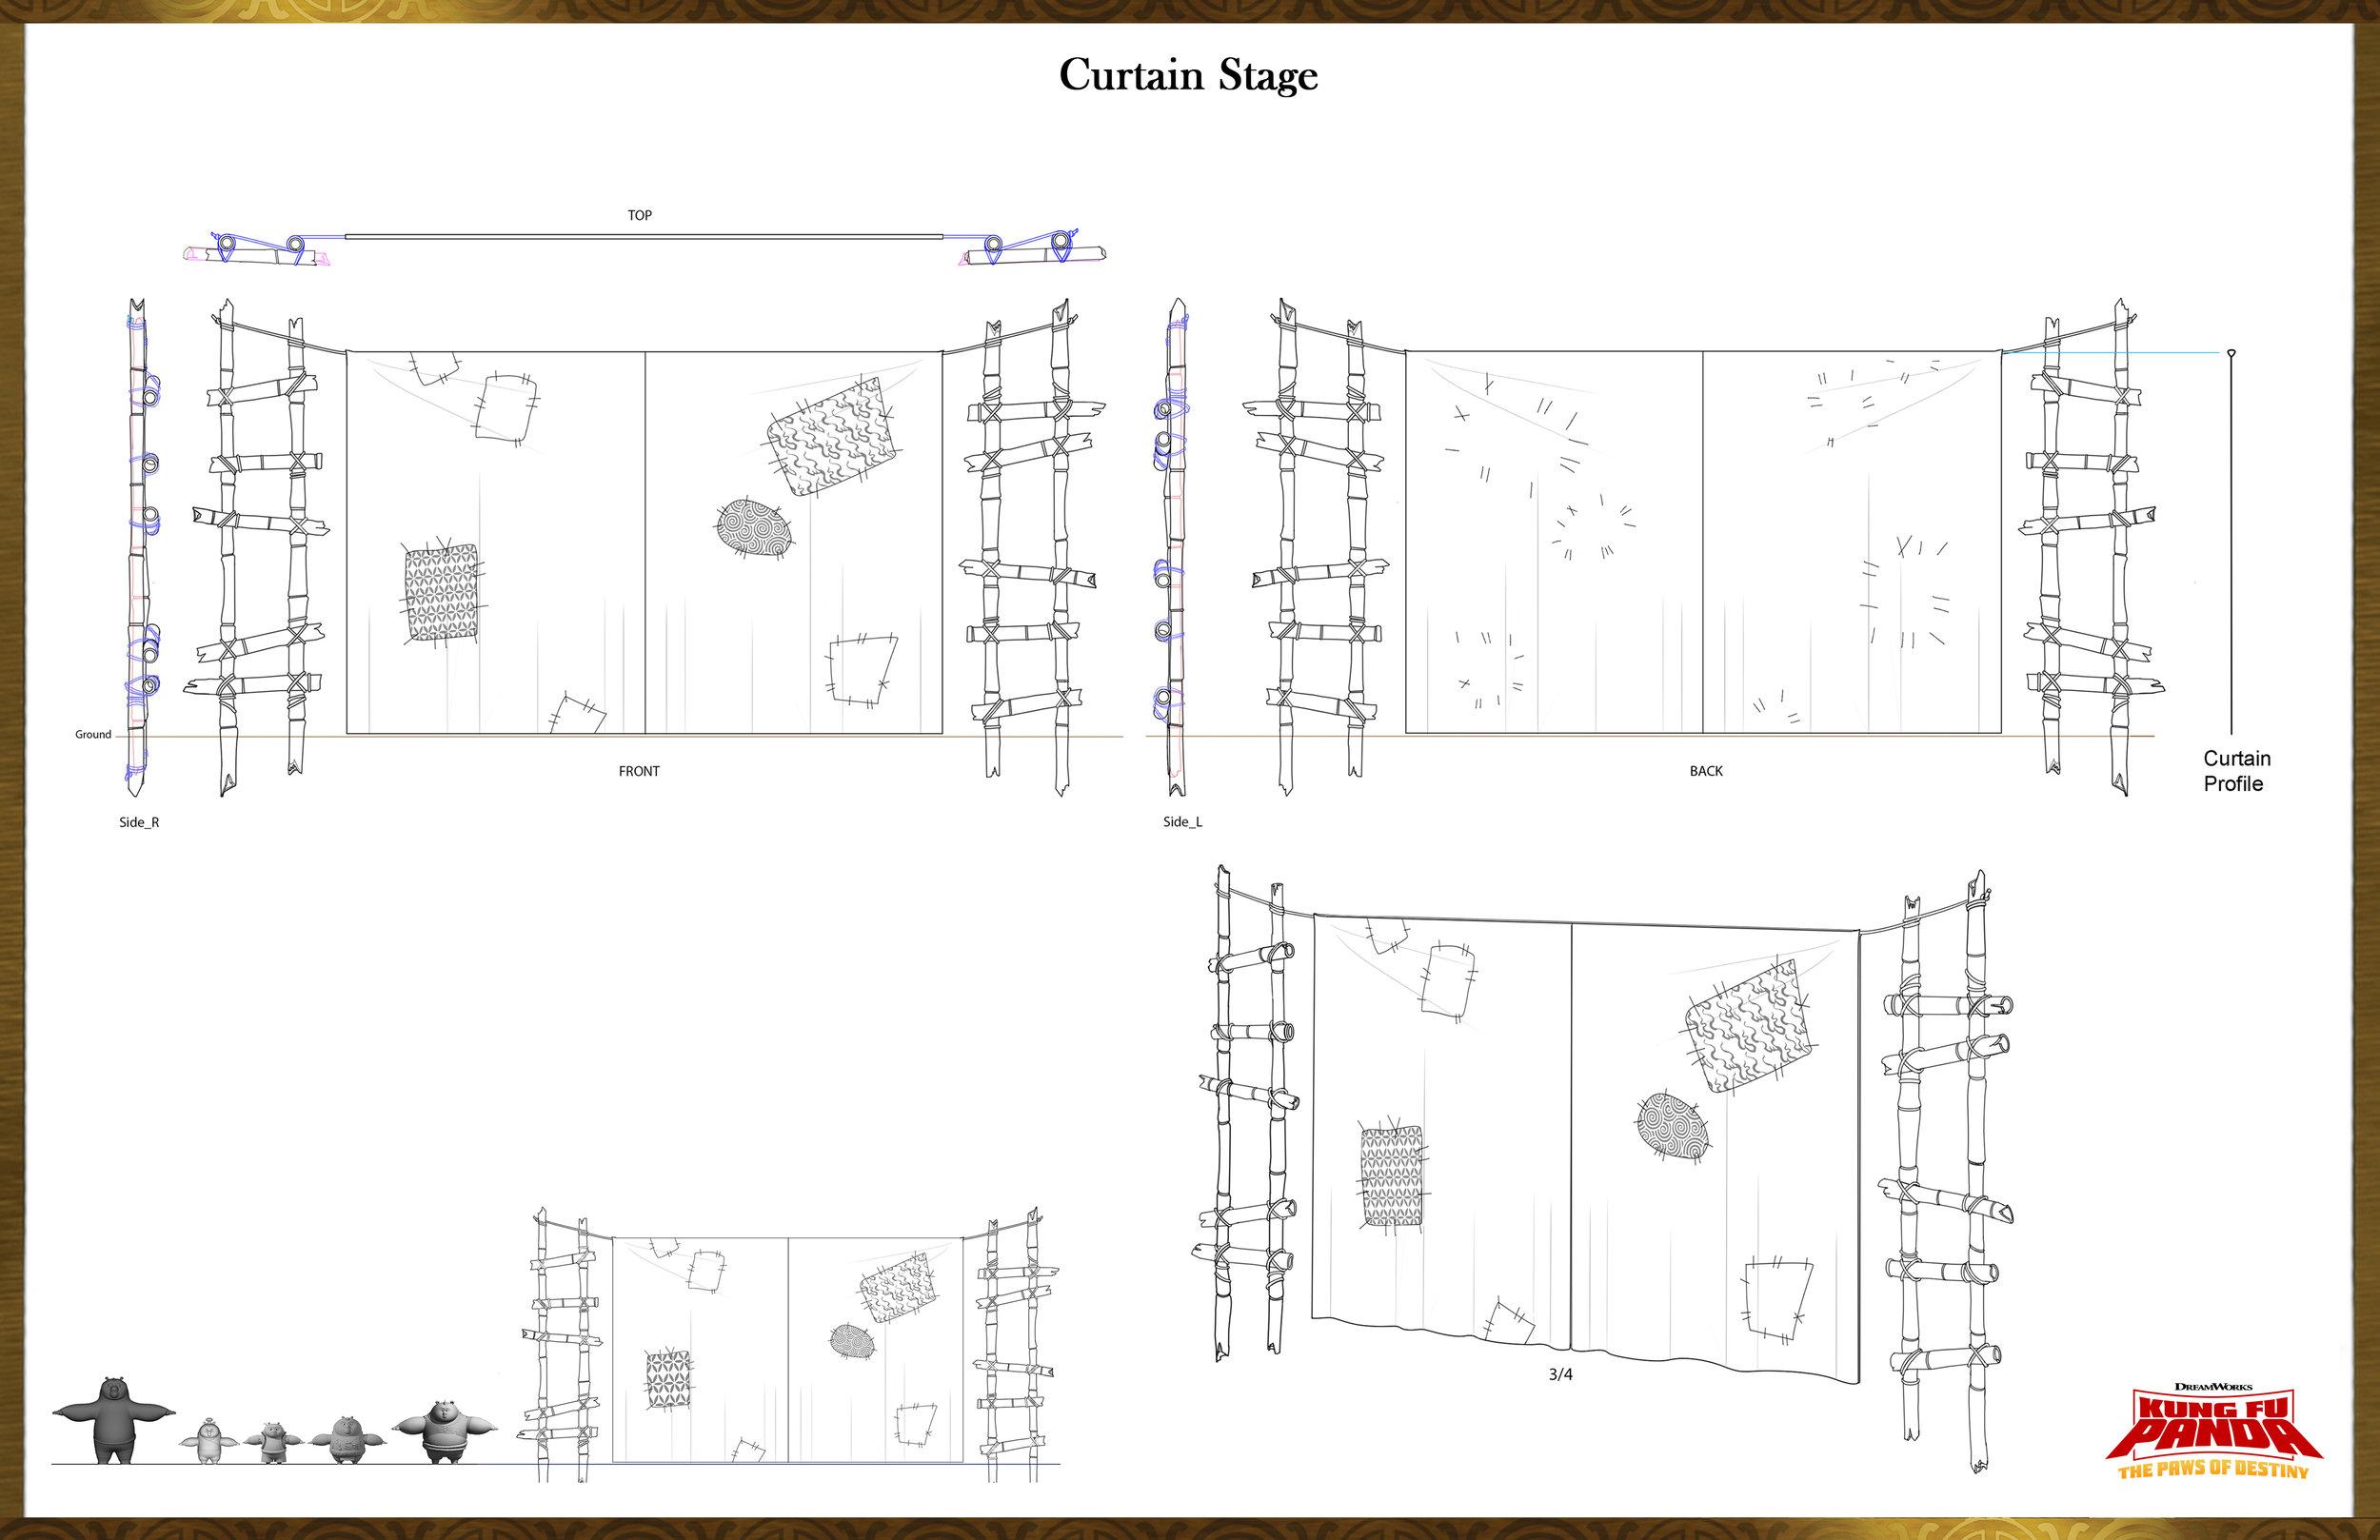 17 KFV_CurtainStageA_Trn_Szc_Clc.jpg